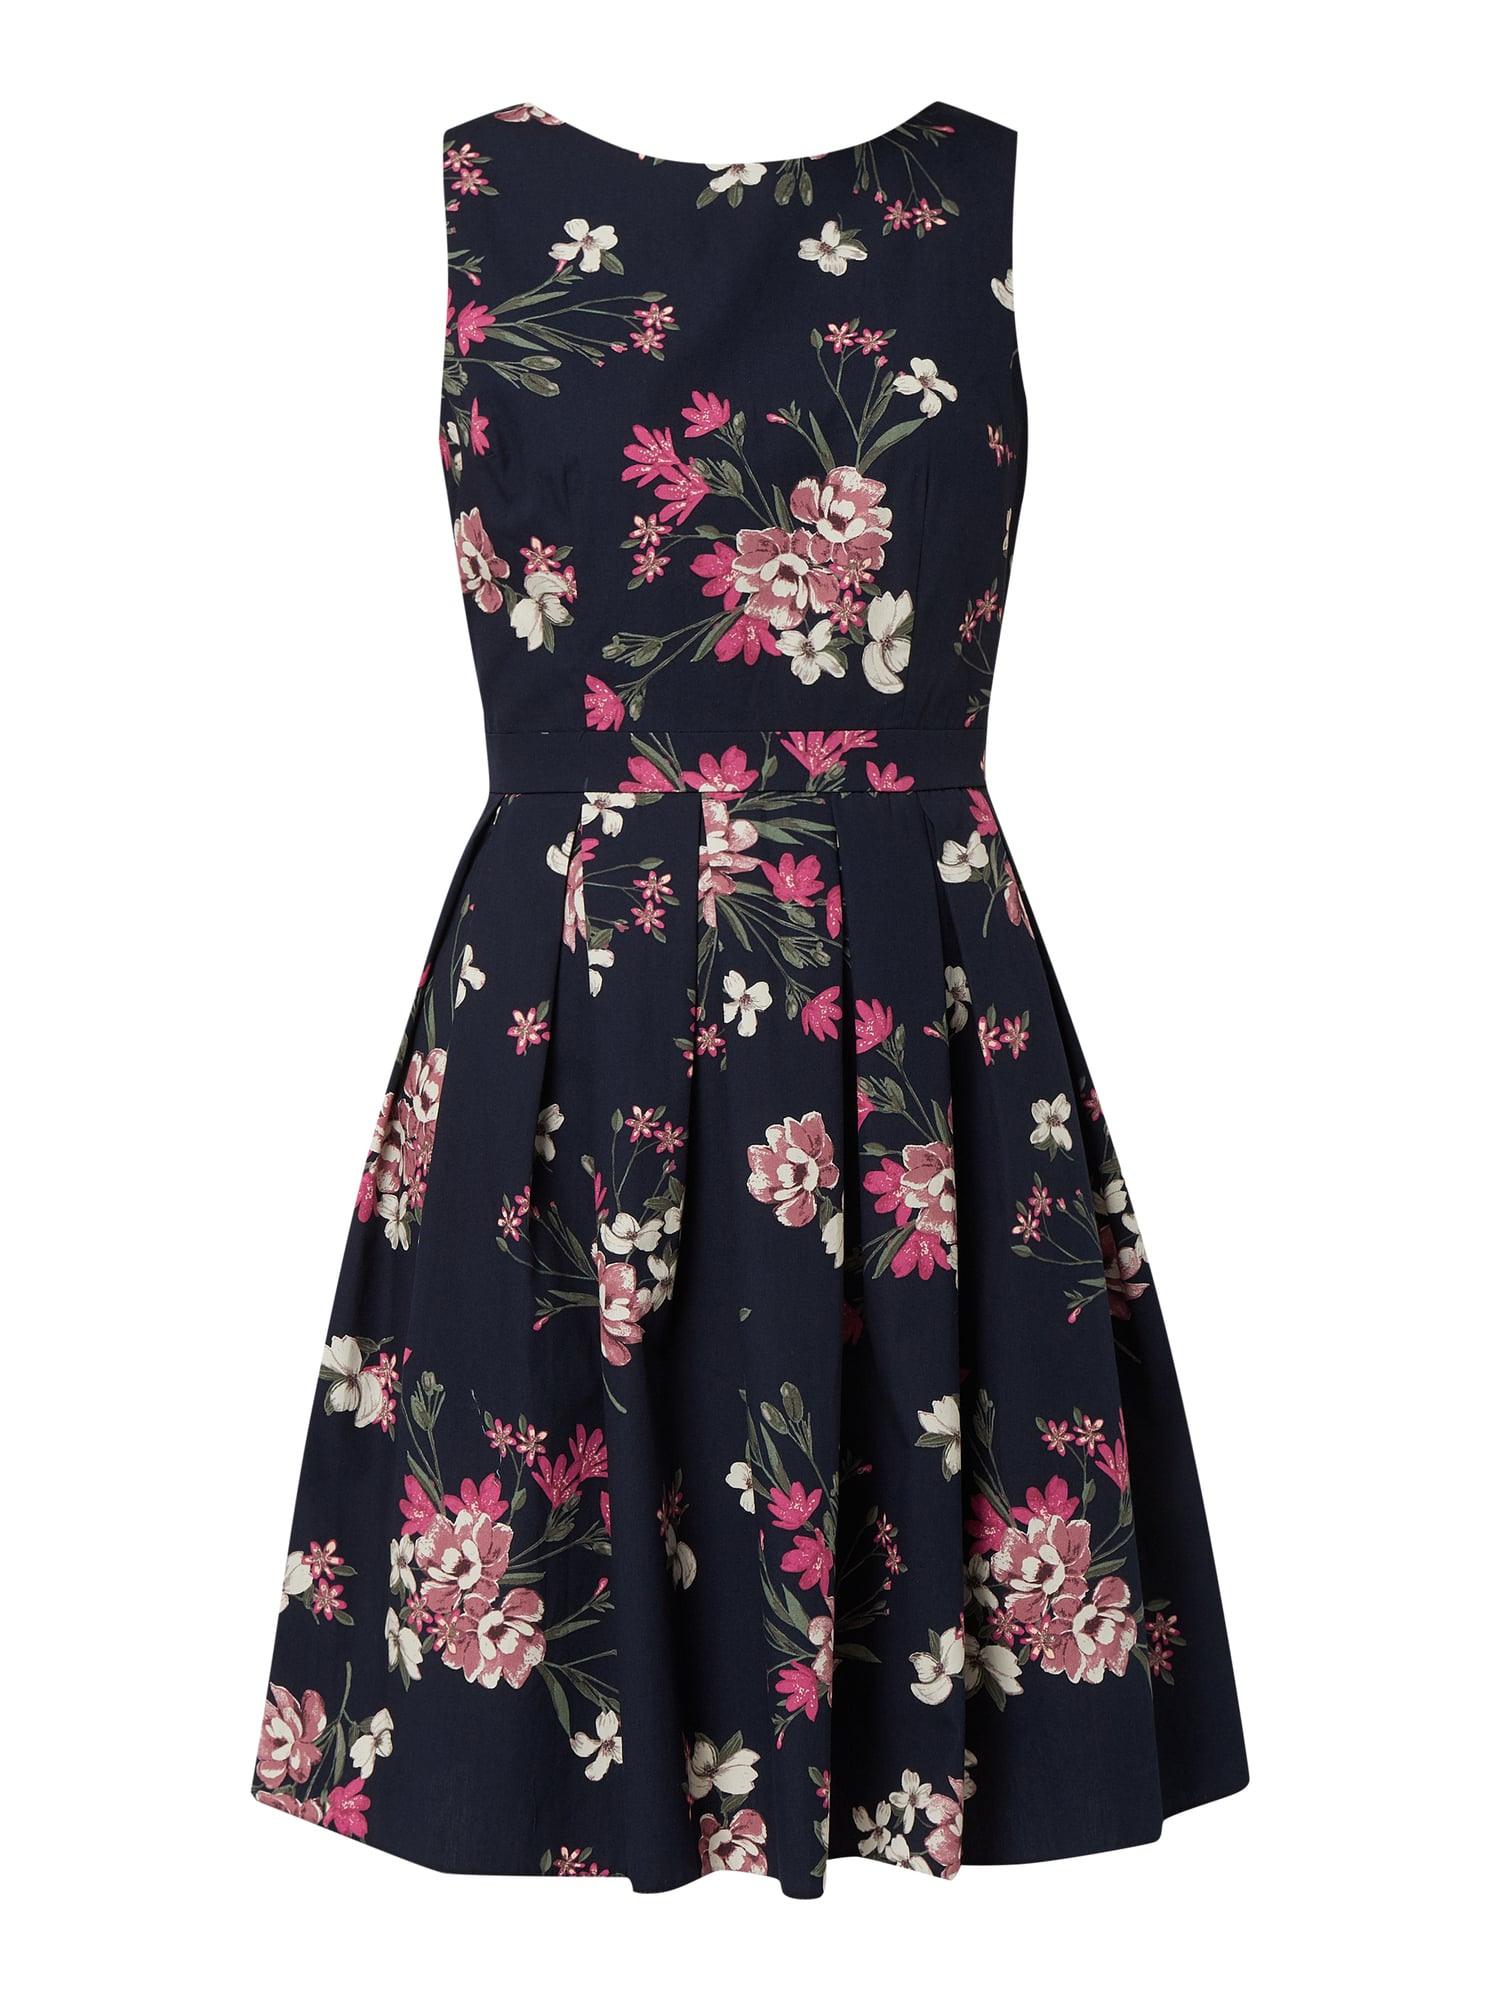 Apricot Kleid Mit Floralem Muster In Lila Online Kaufen